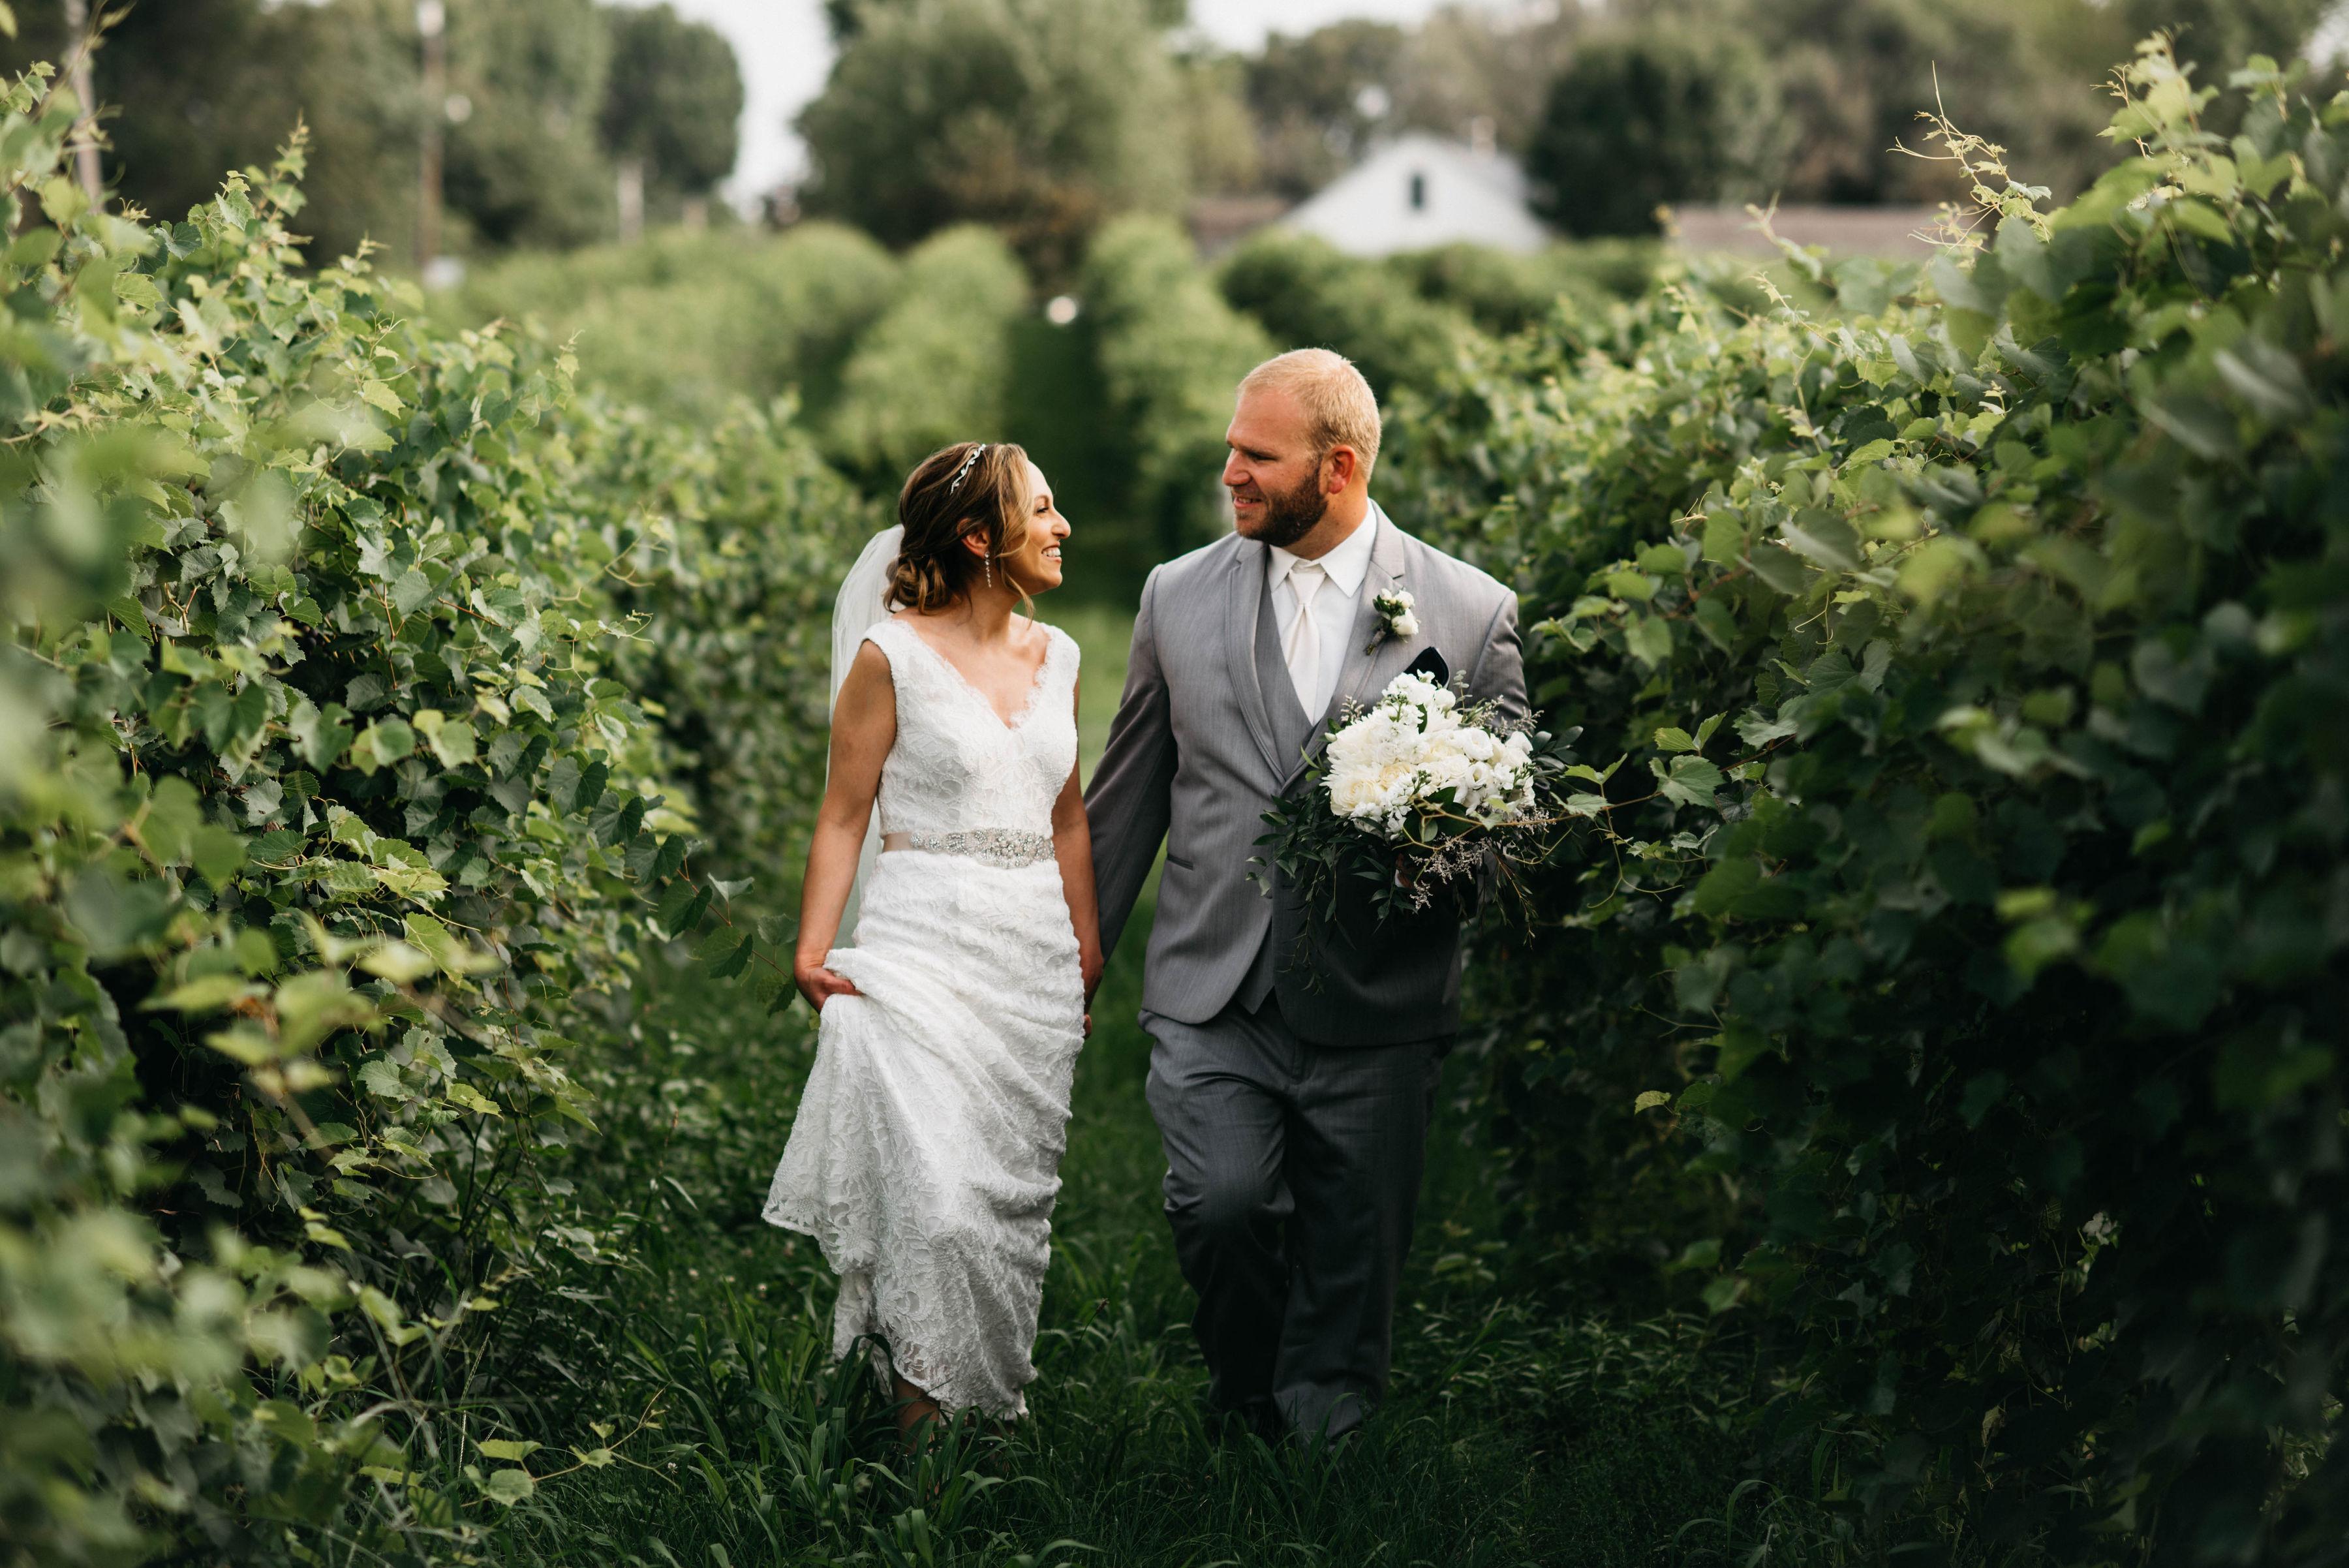 2. Bridal Session